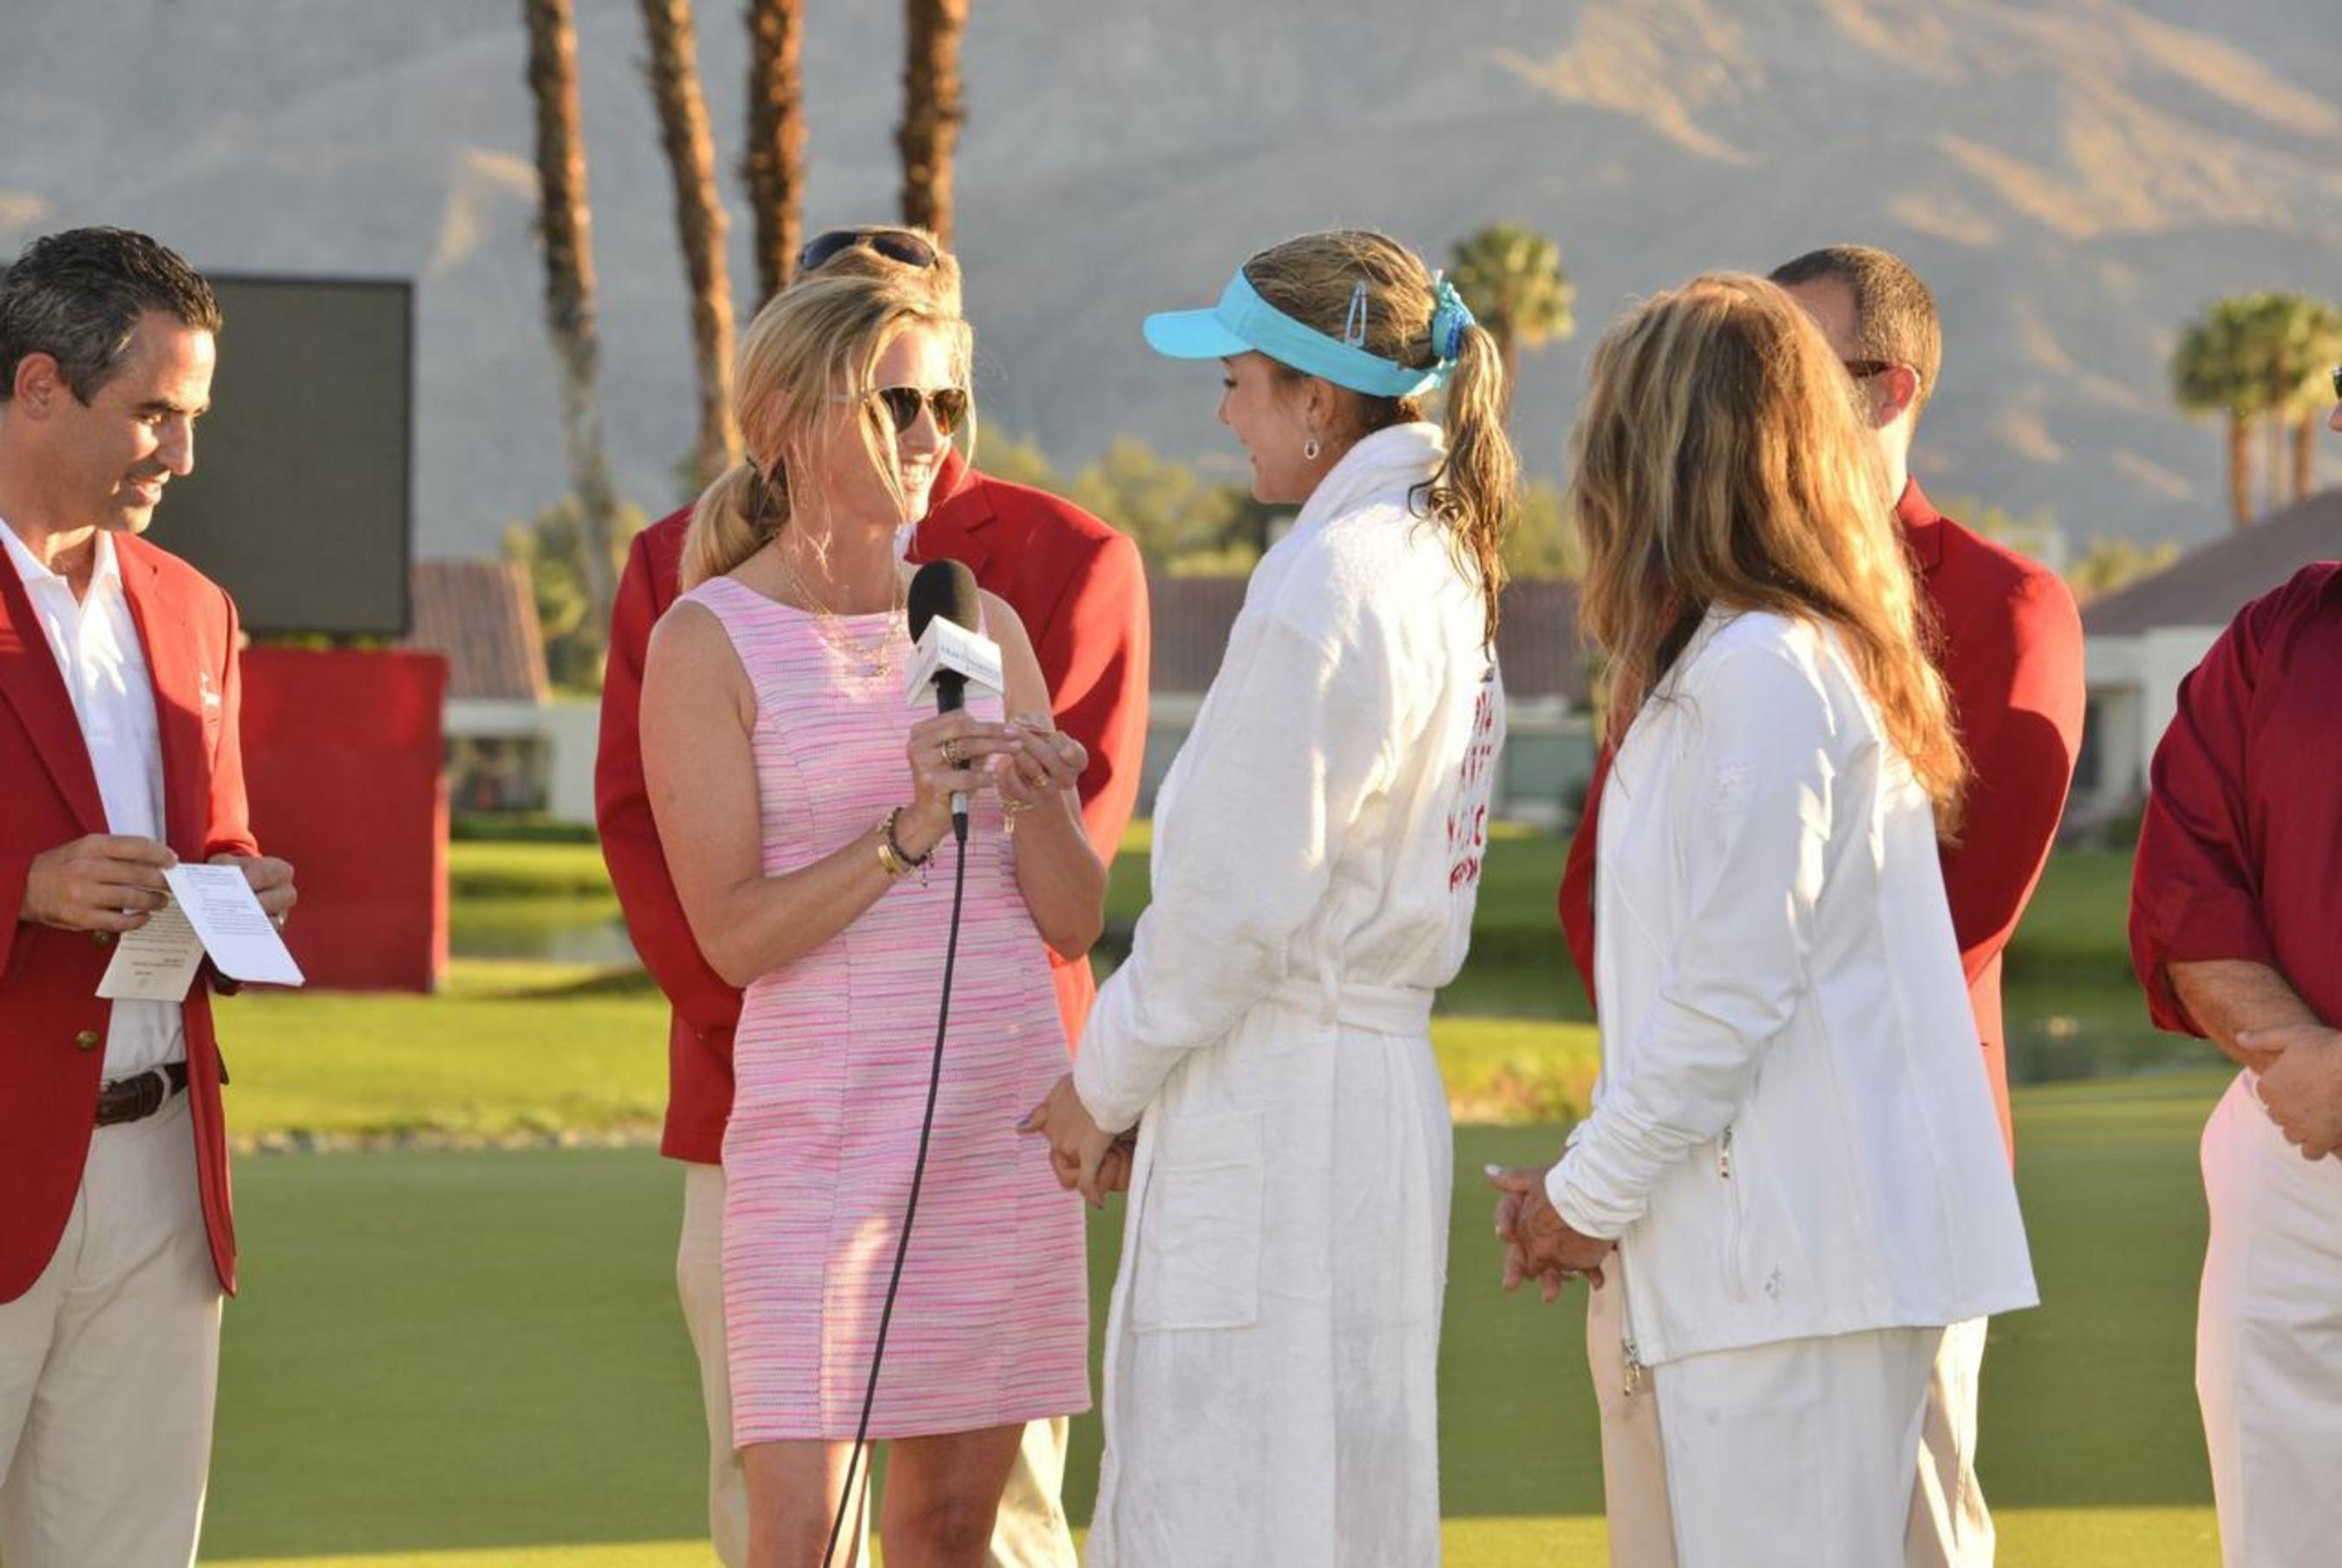 Heather Moore Jewelry Announces Kraft Nabisco Championship Sponsorship (PRNewsFoto/Heather Moore Jewelry )